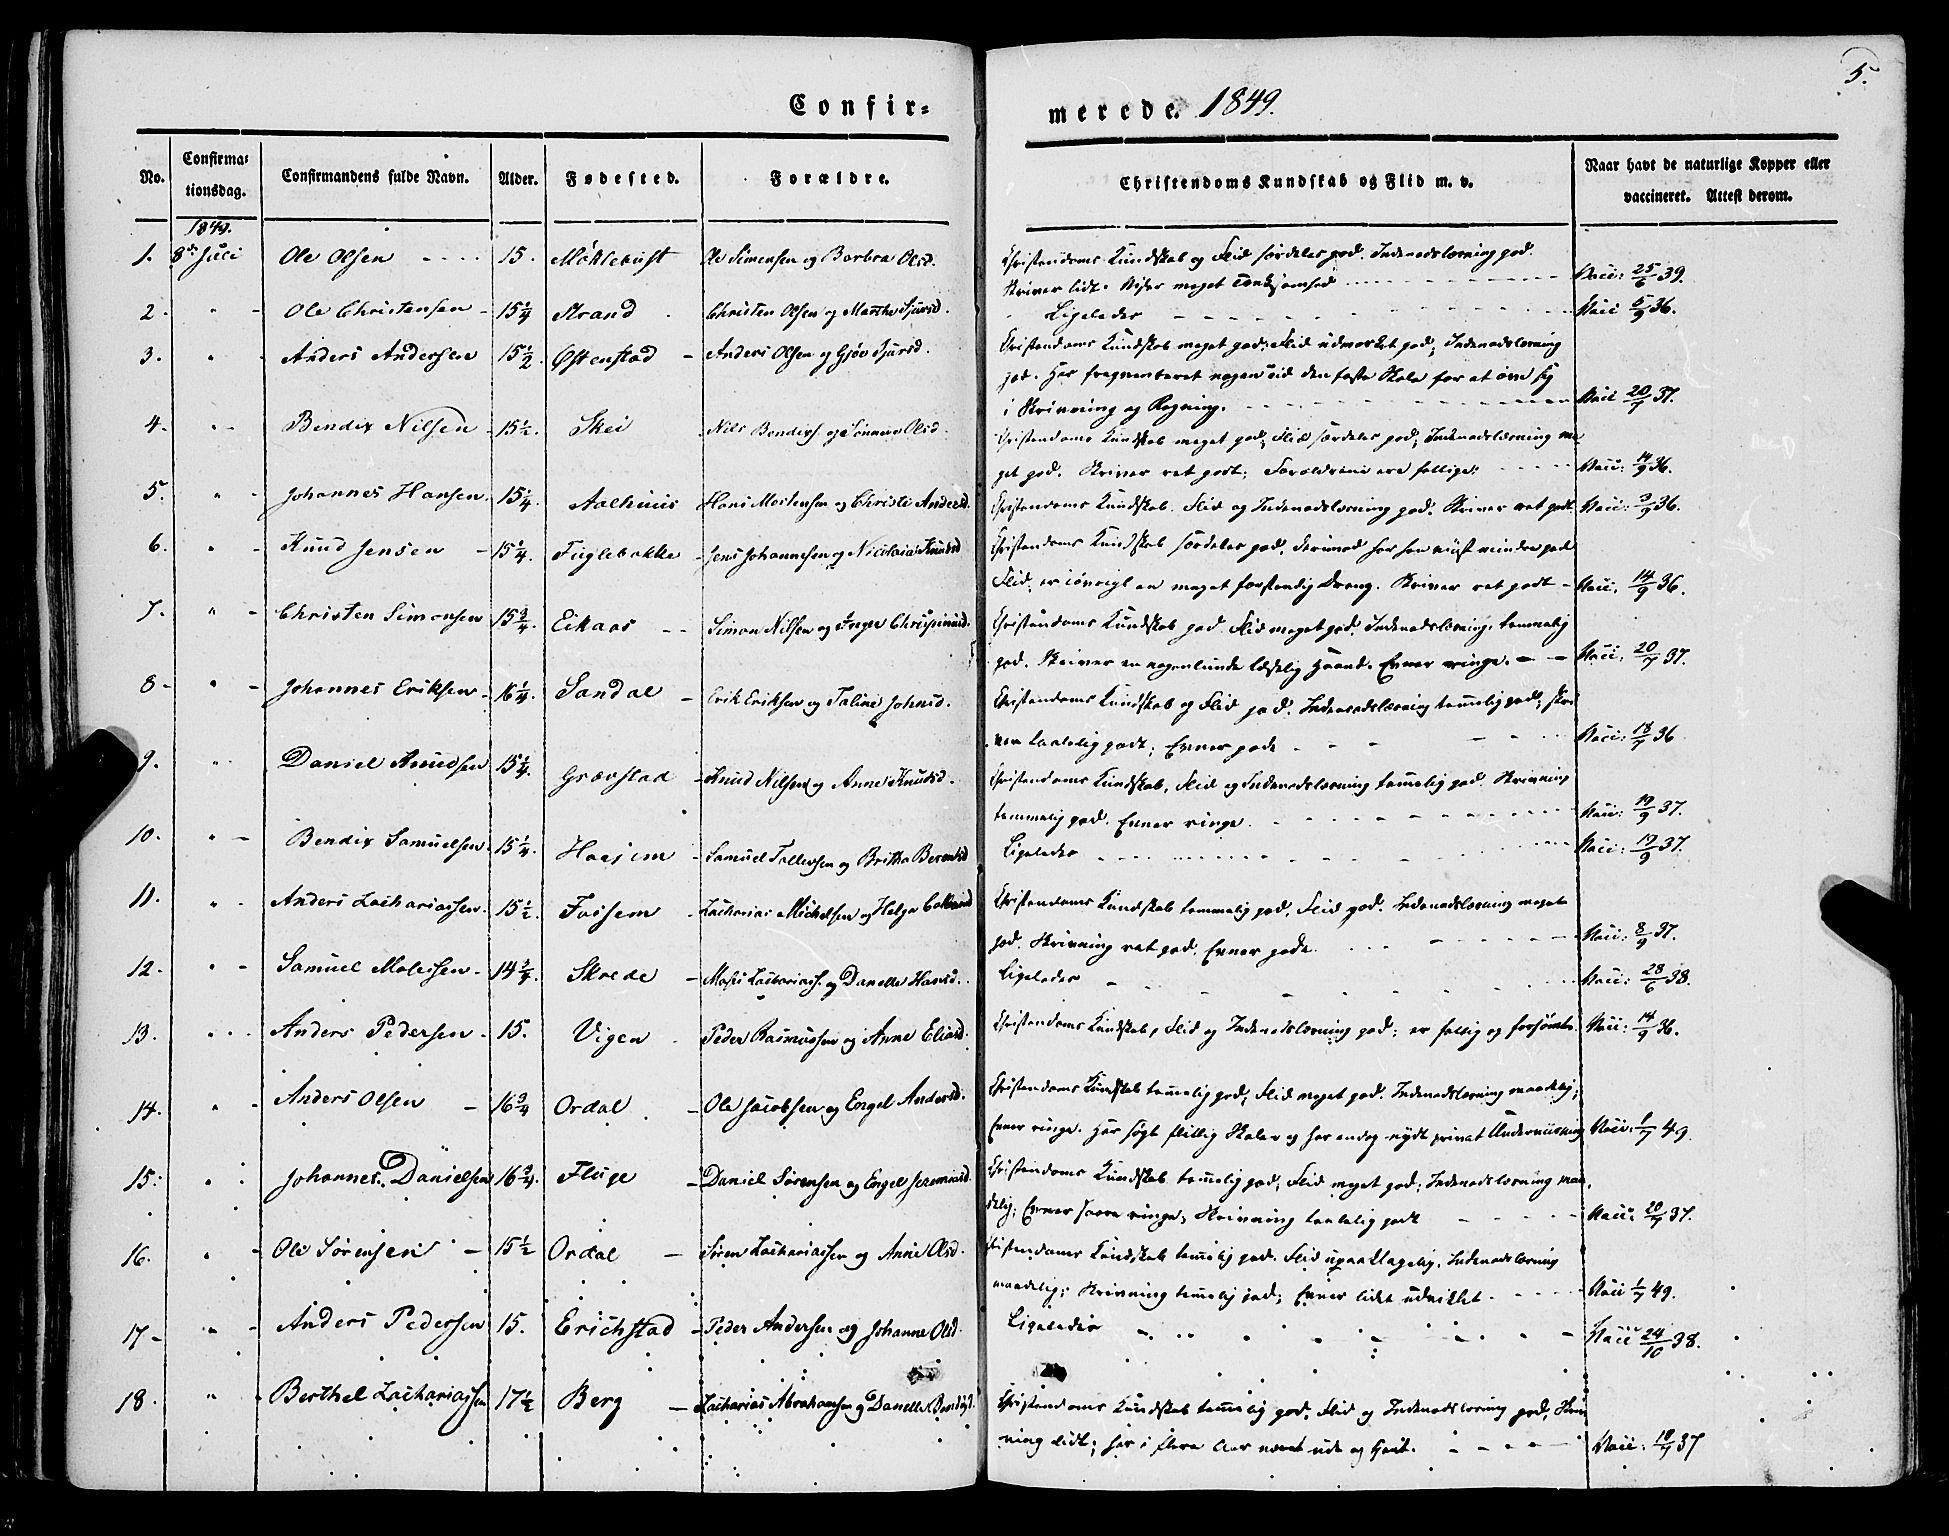 SAB, Jølster sokneprestembete, H/Haa/Haaa/L0010: Parish register (official) no. A 10, 1847-1865, p. 5